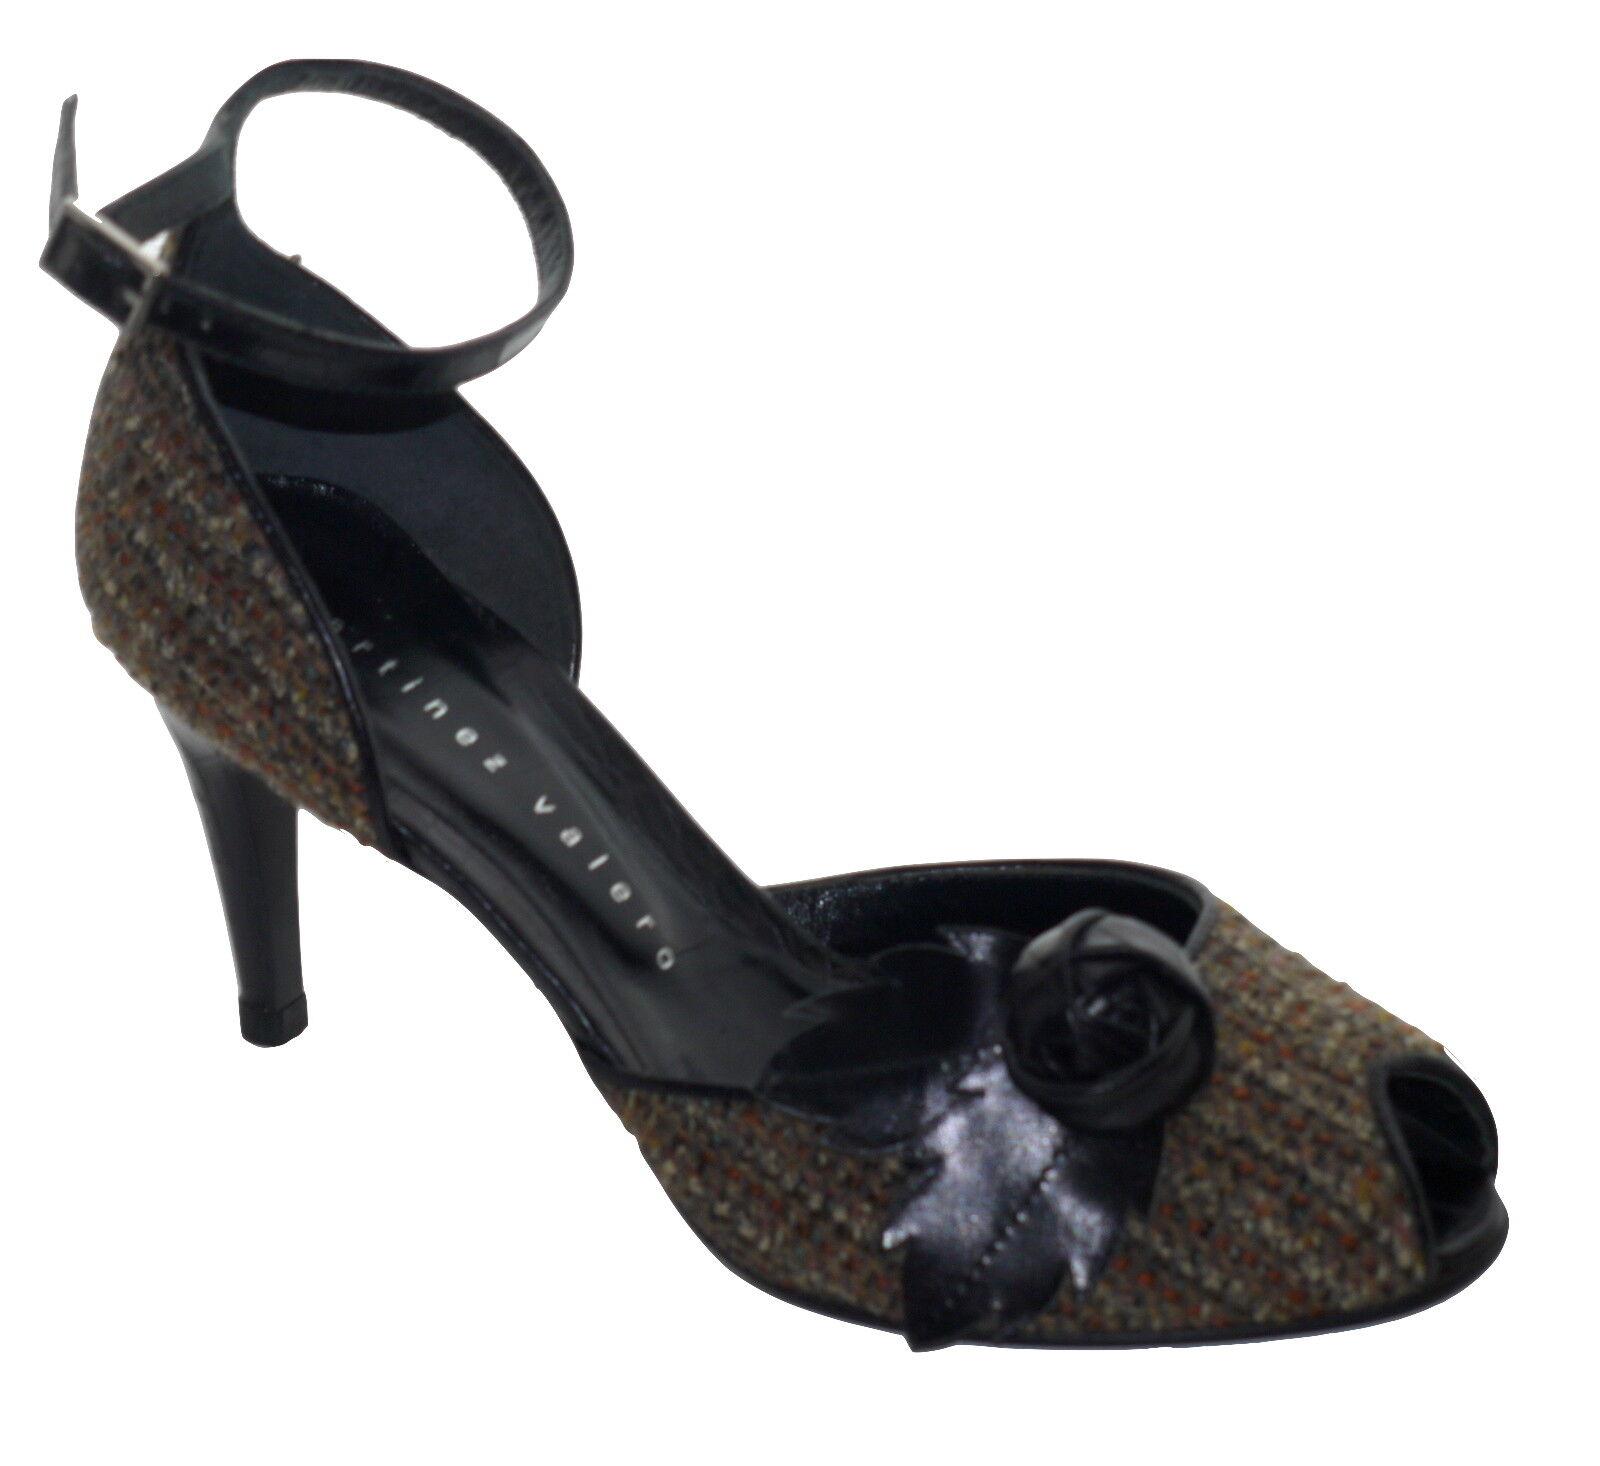 Martinez Valero Tweed Peep Toes Schuhes NIB SP